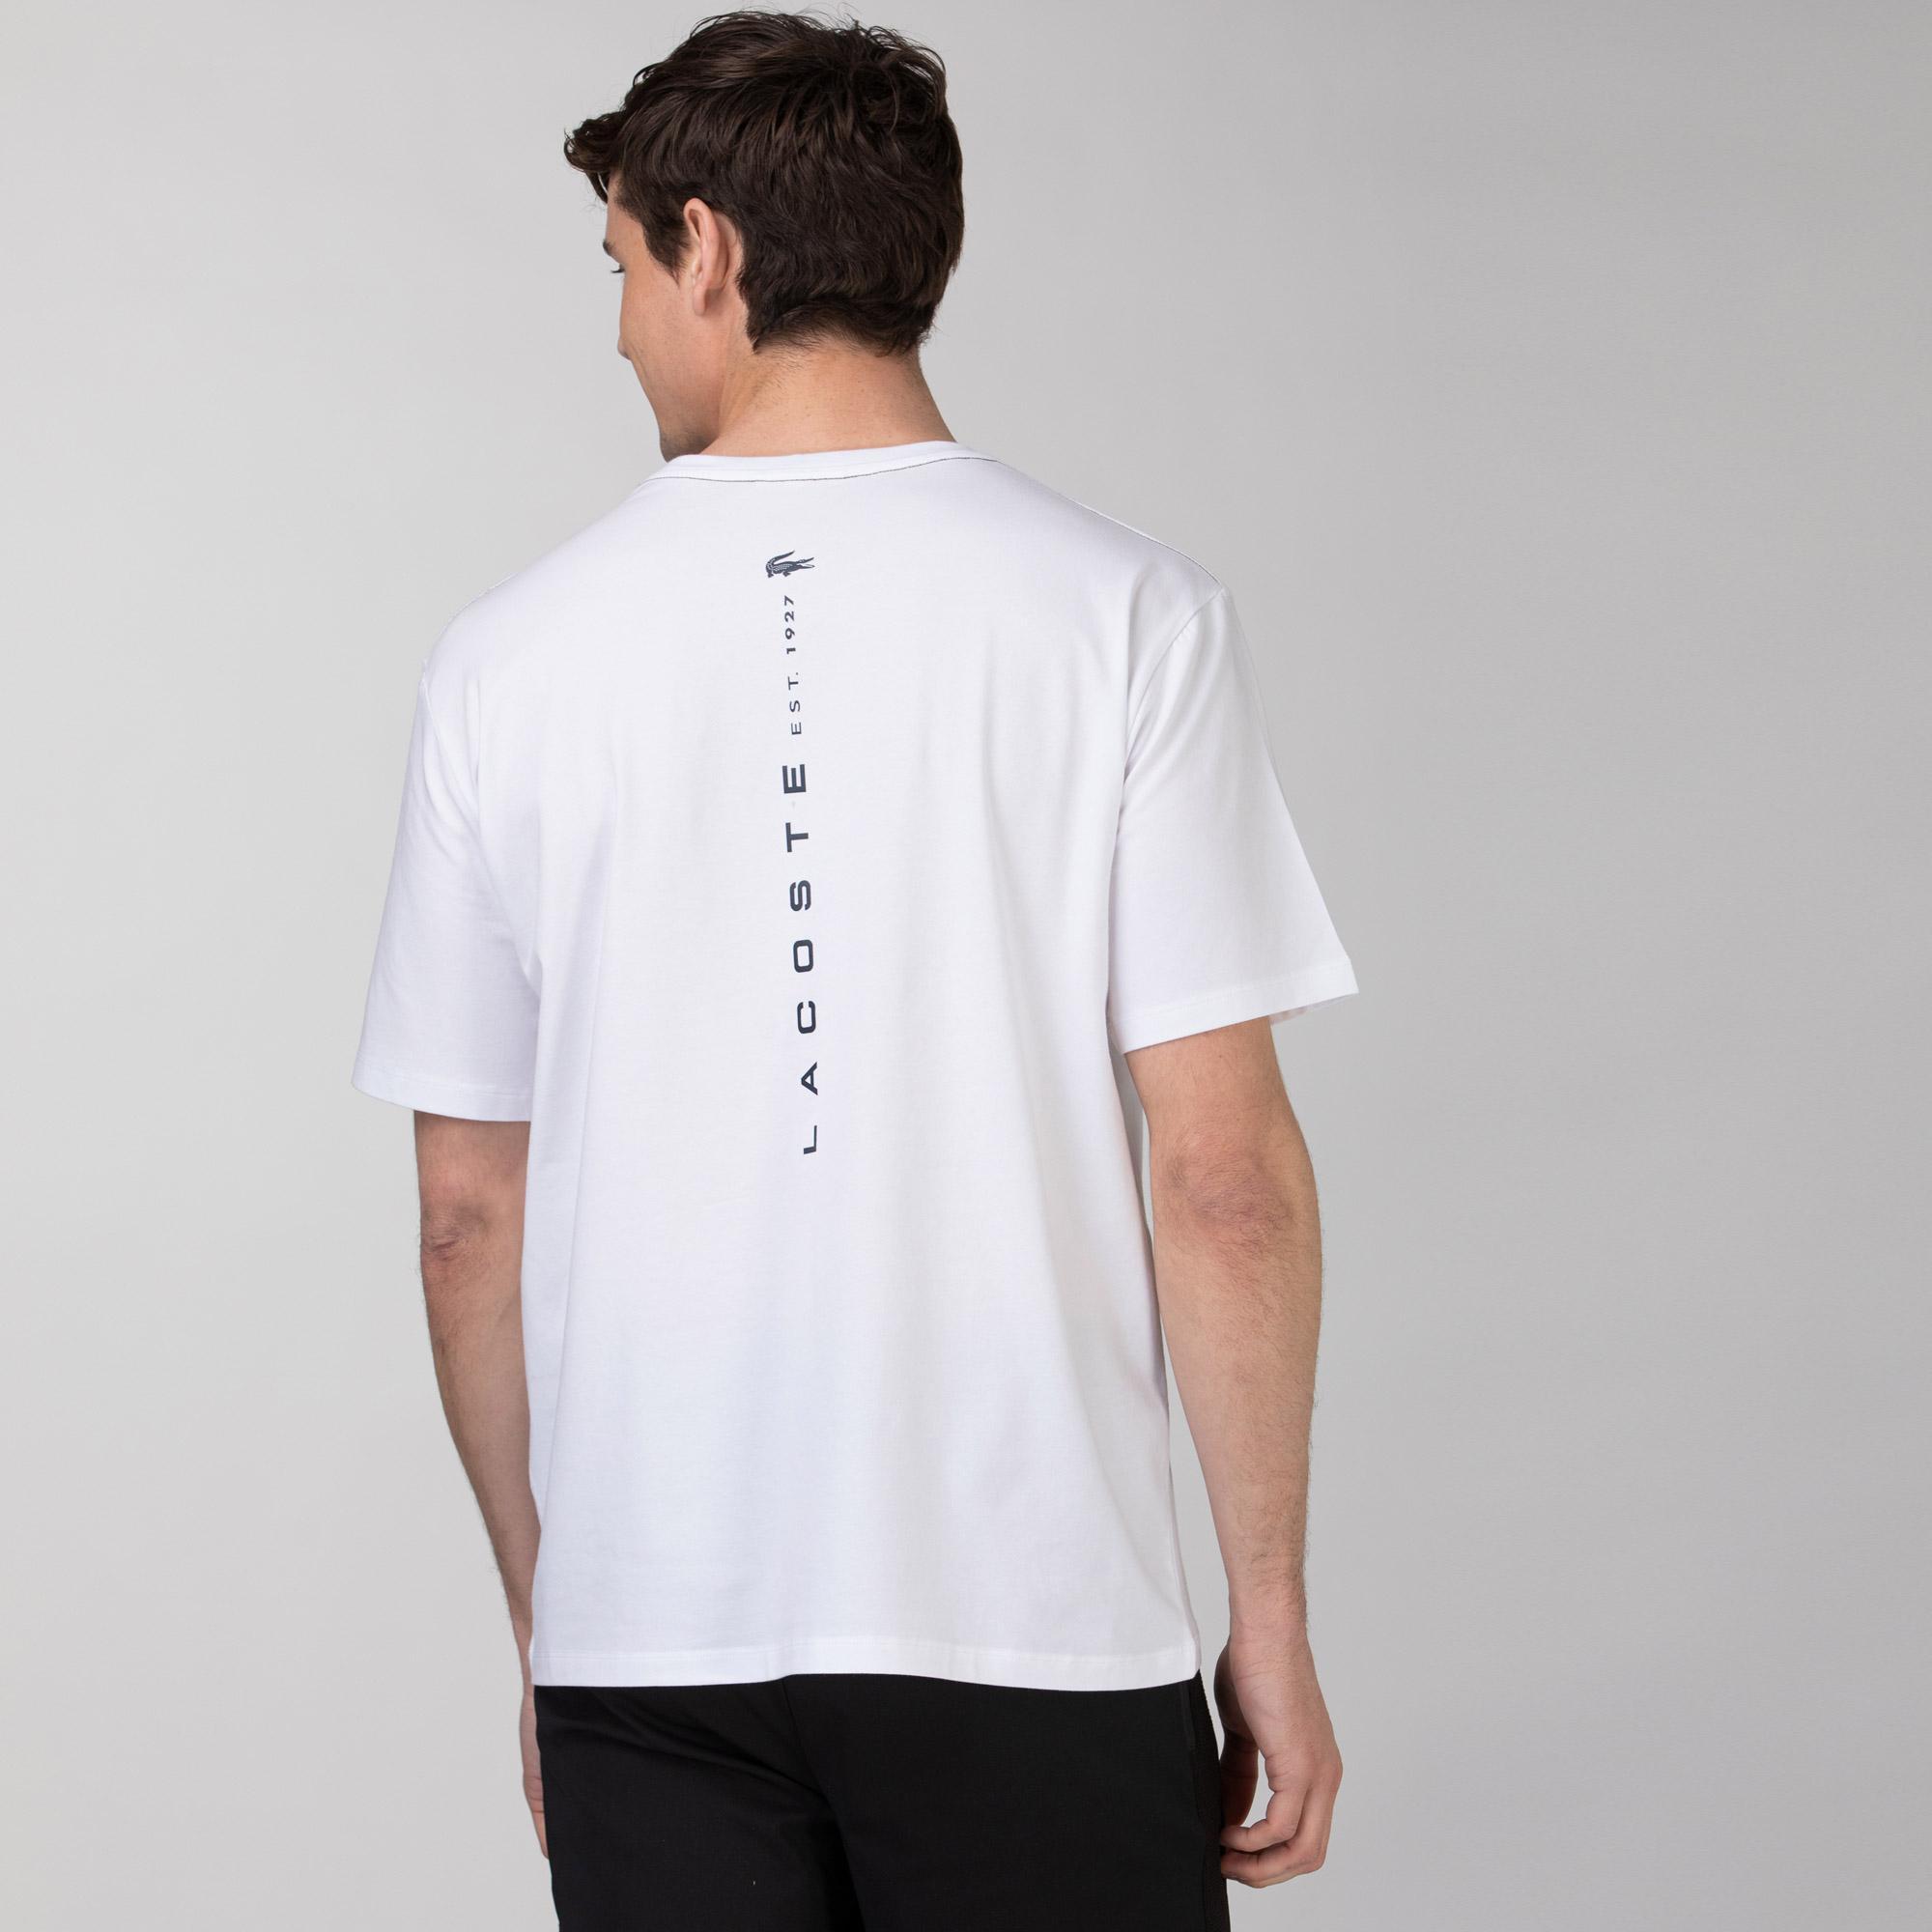 Lacoste Erkek Rahat Fit Bisiklet Yaka Baskılı Beyaz T-Shirt